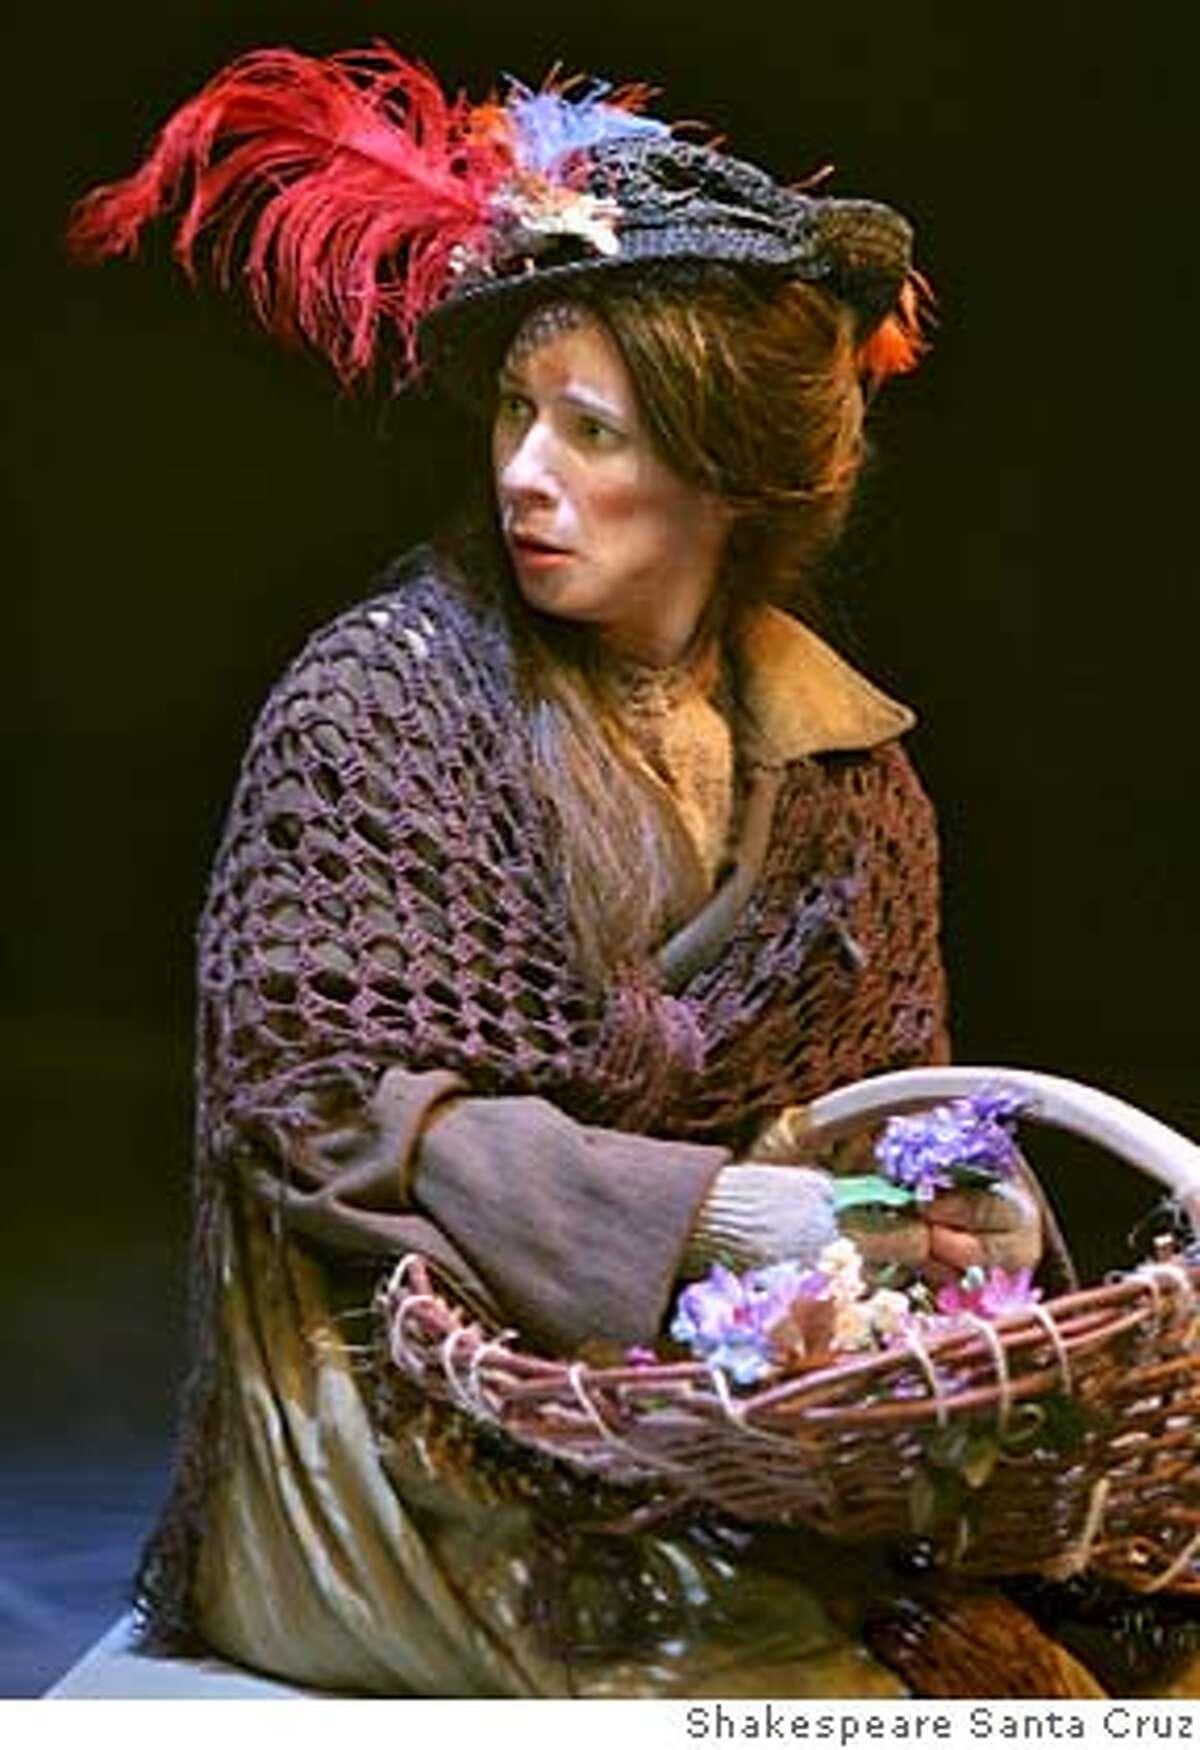 Julia Coffey as Eliza Doolittle in Pygmalion. CR: Shakespeare Santa Cruz